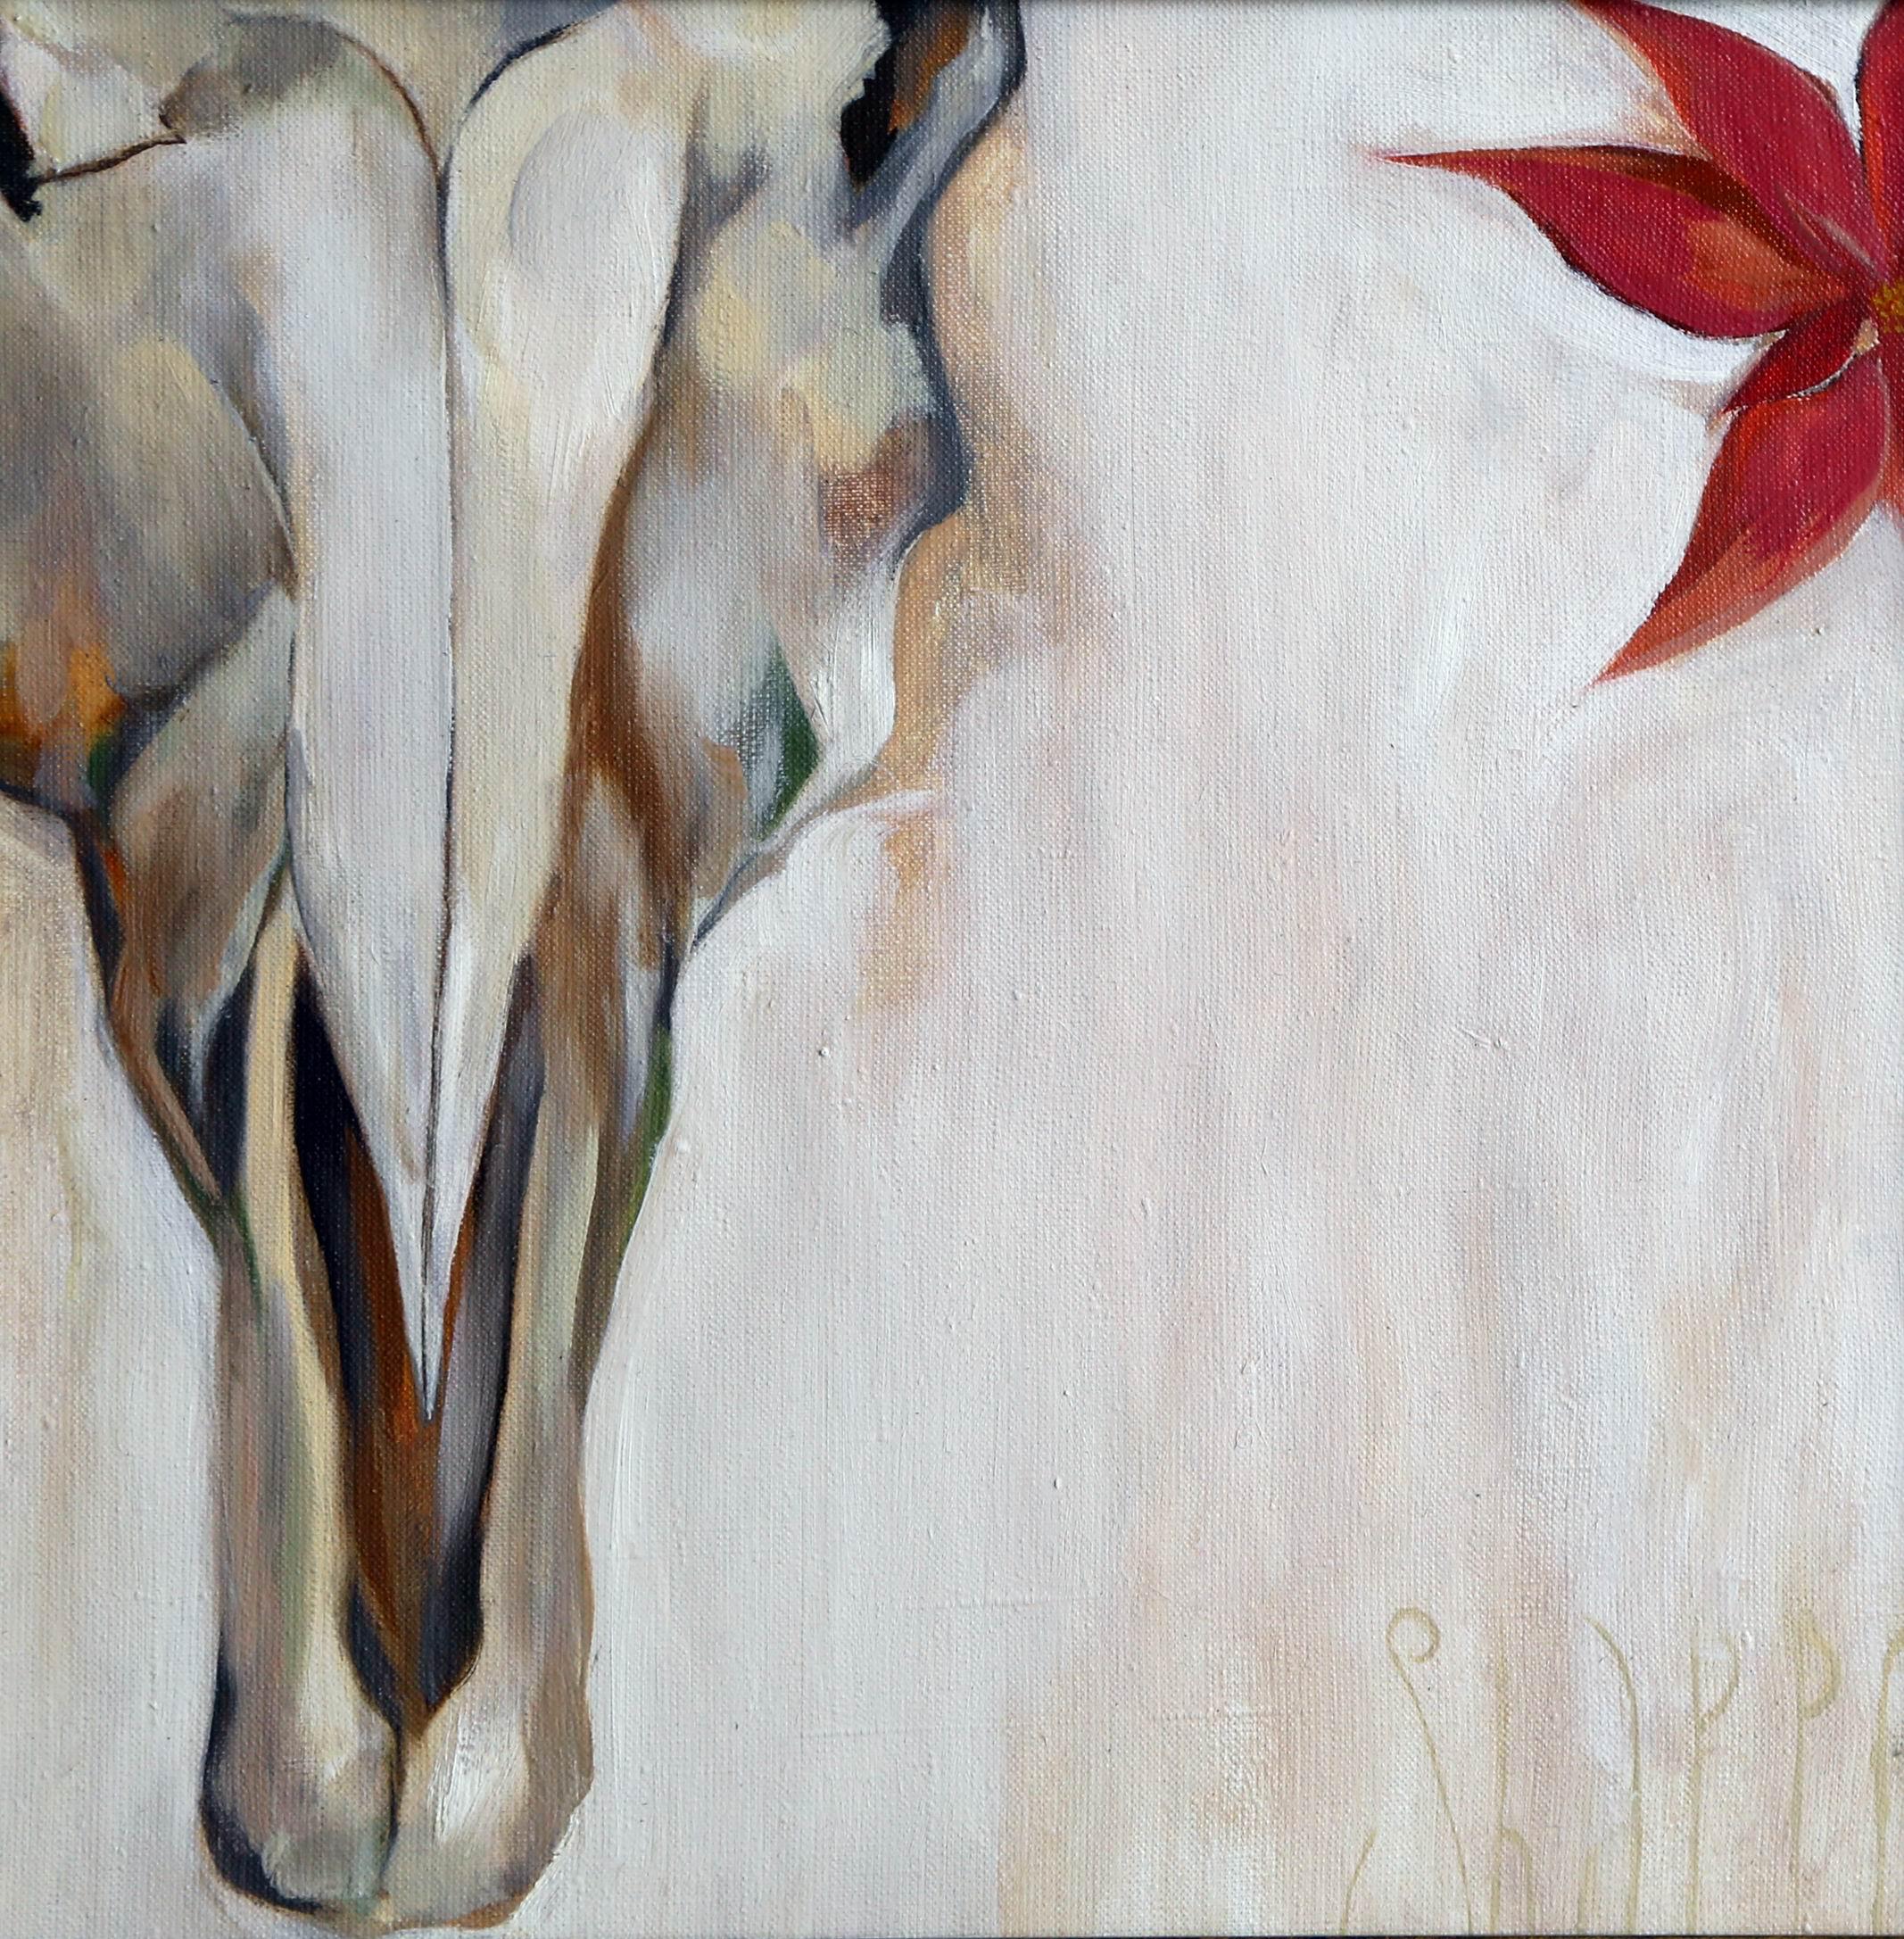 LA MAÑANA. canvas. oil. 40X40 cm.